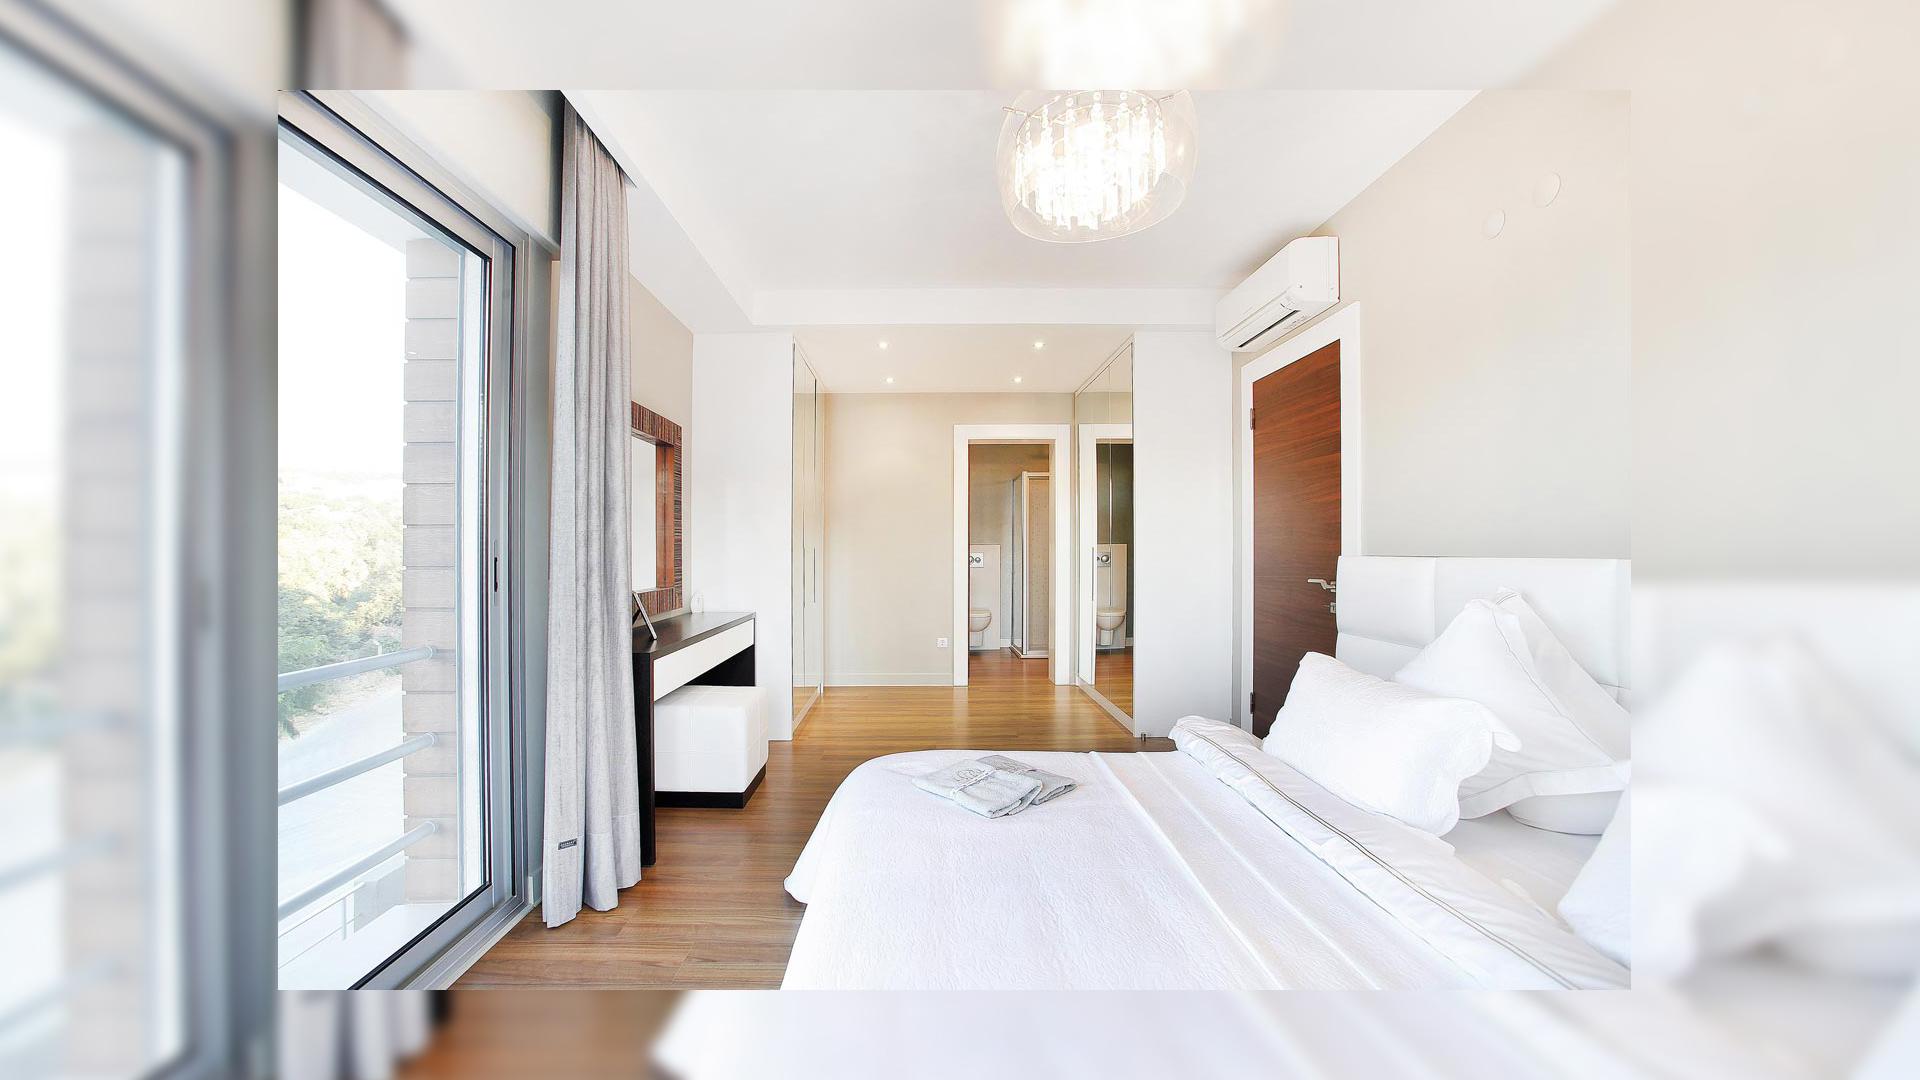 Mi'Marin Paşalimanı Villaları Yatak Odası